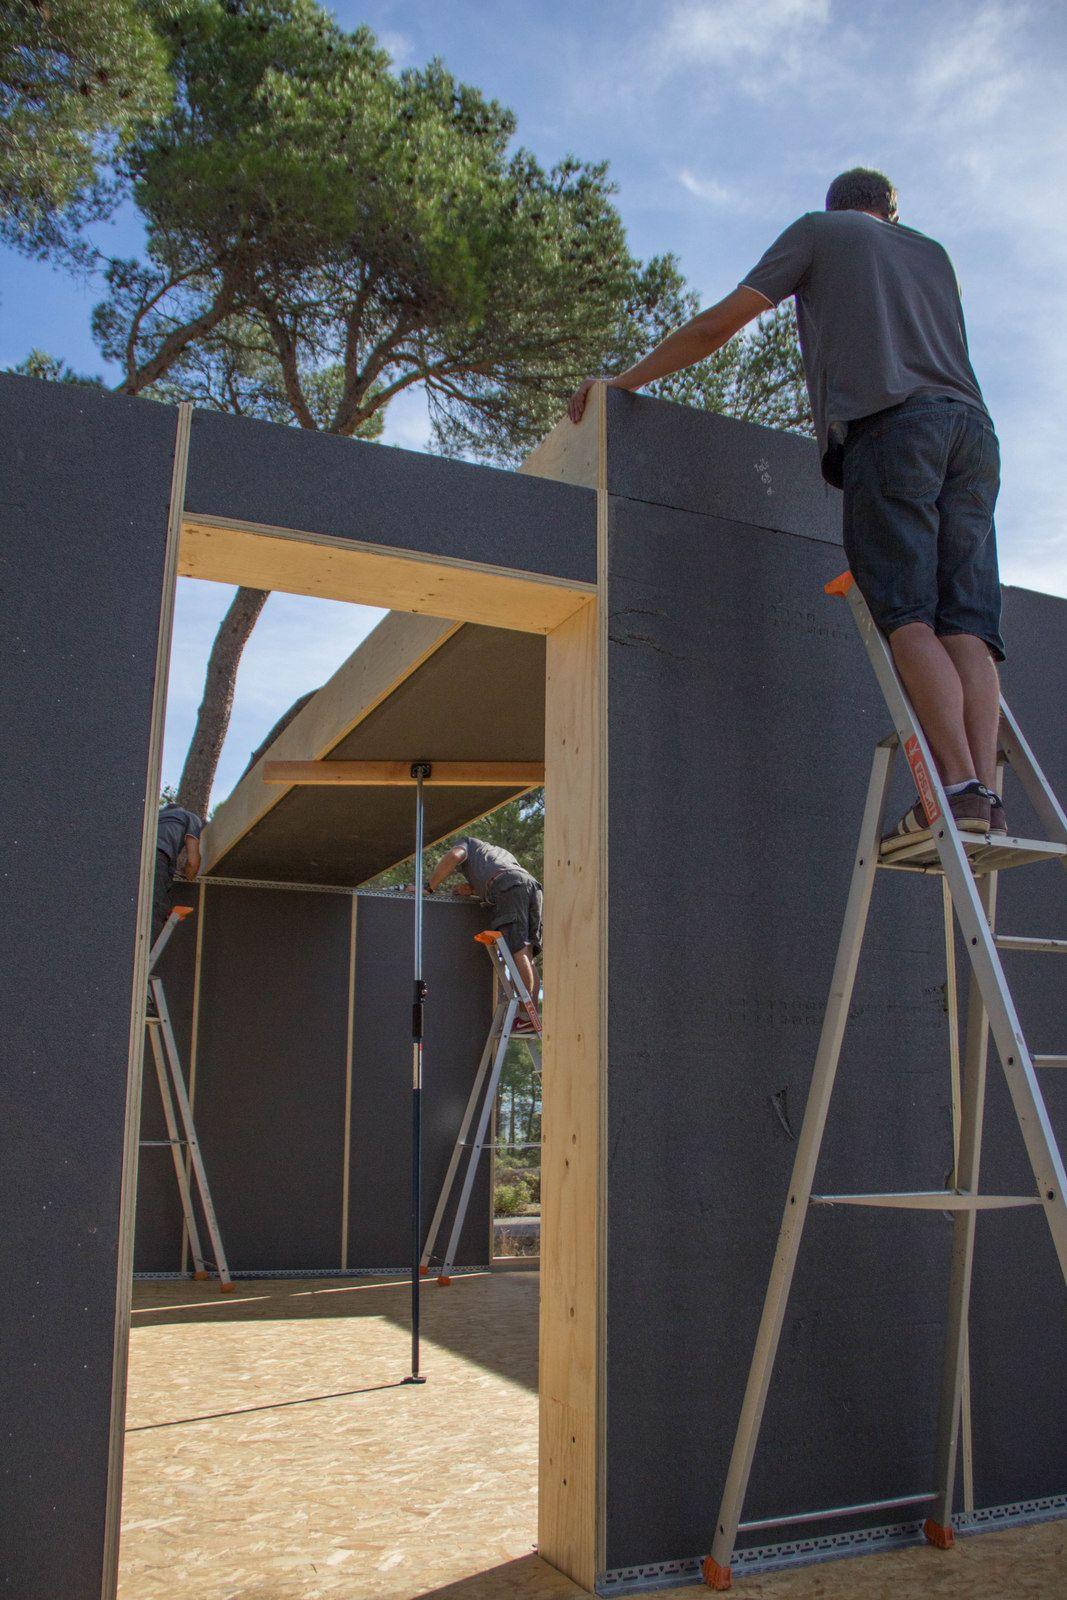 150m passive house popup house pas vne domy pinterest holzarbeiten und h uschen. Black Bedroom Furniture Sets. Home Design Ideas